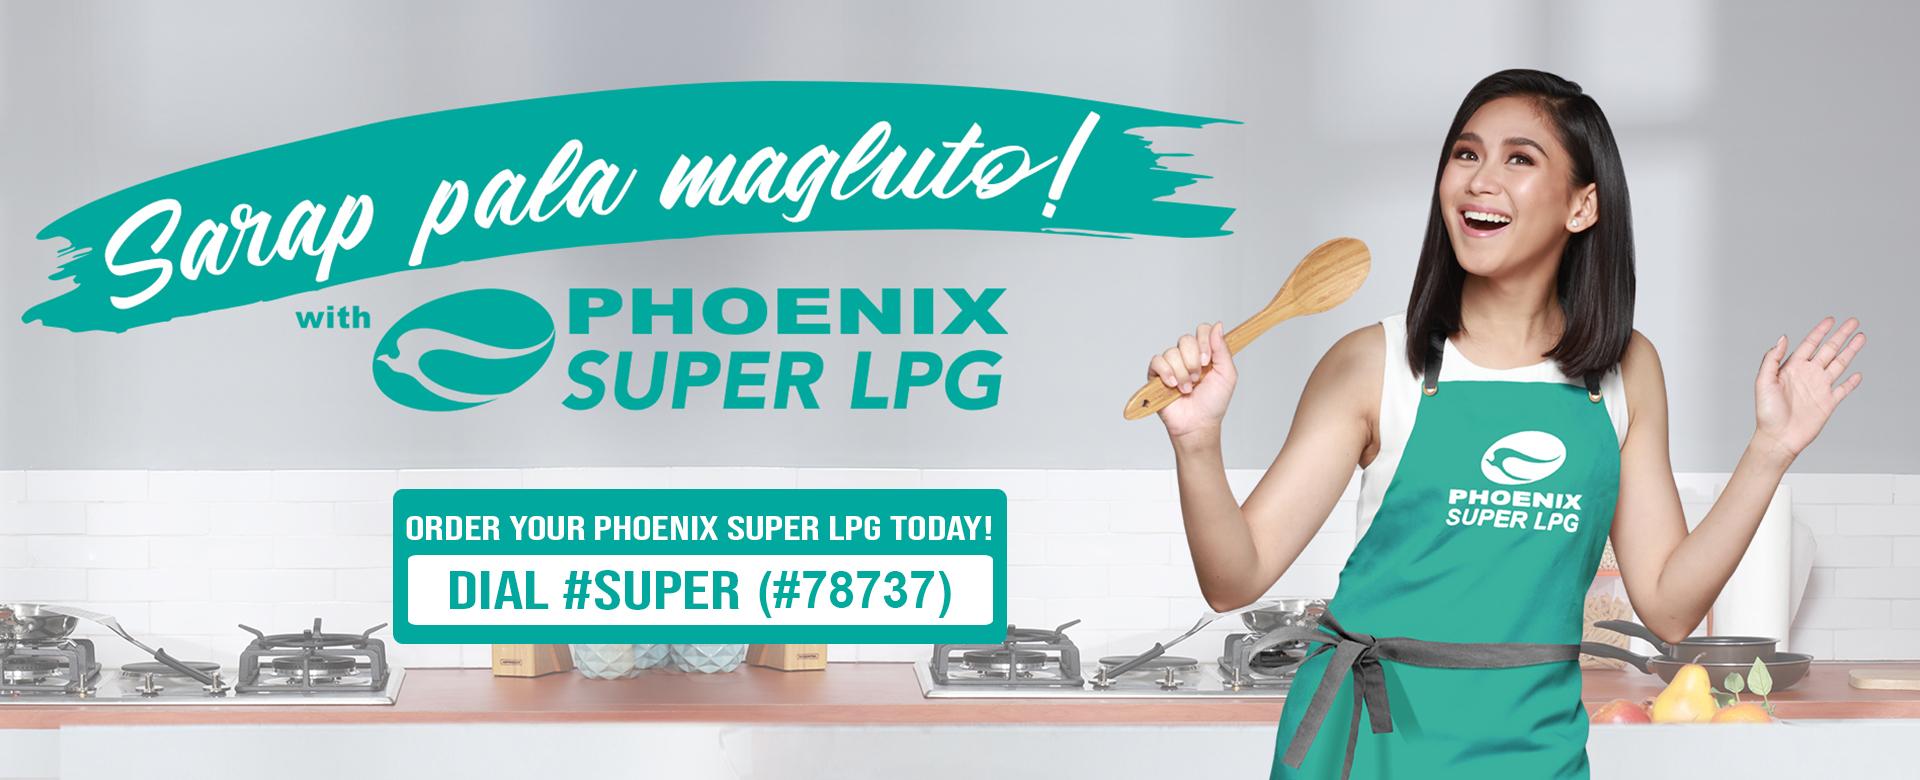 Phoenix Super LPG - Sarap Pala Magluto!